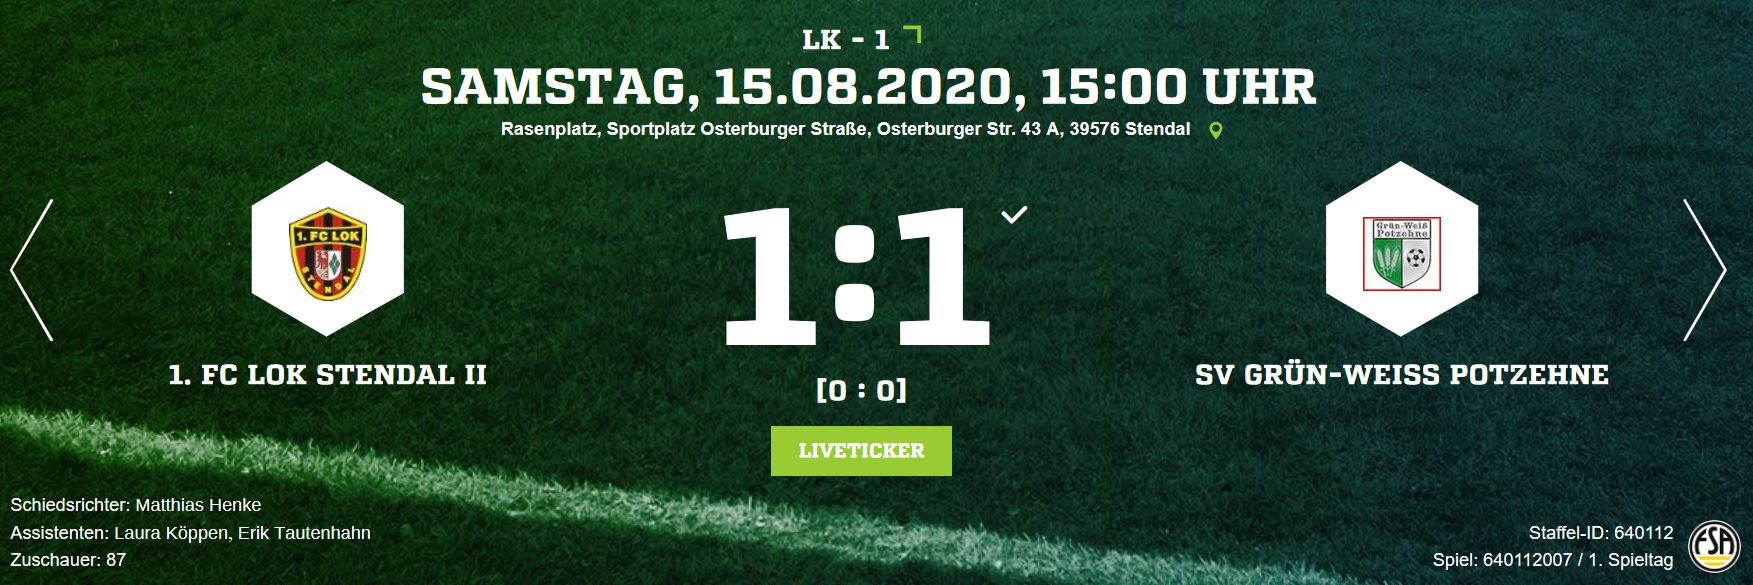 Landesklasse 1 ► 1. Spieltag - 1. FC Lok Stendal